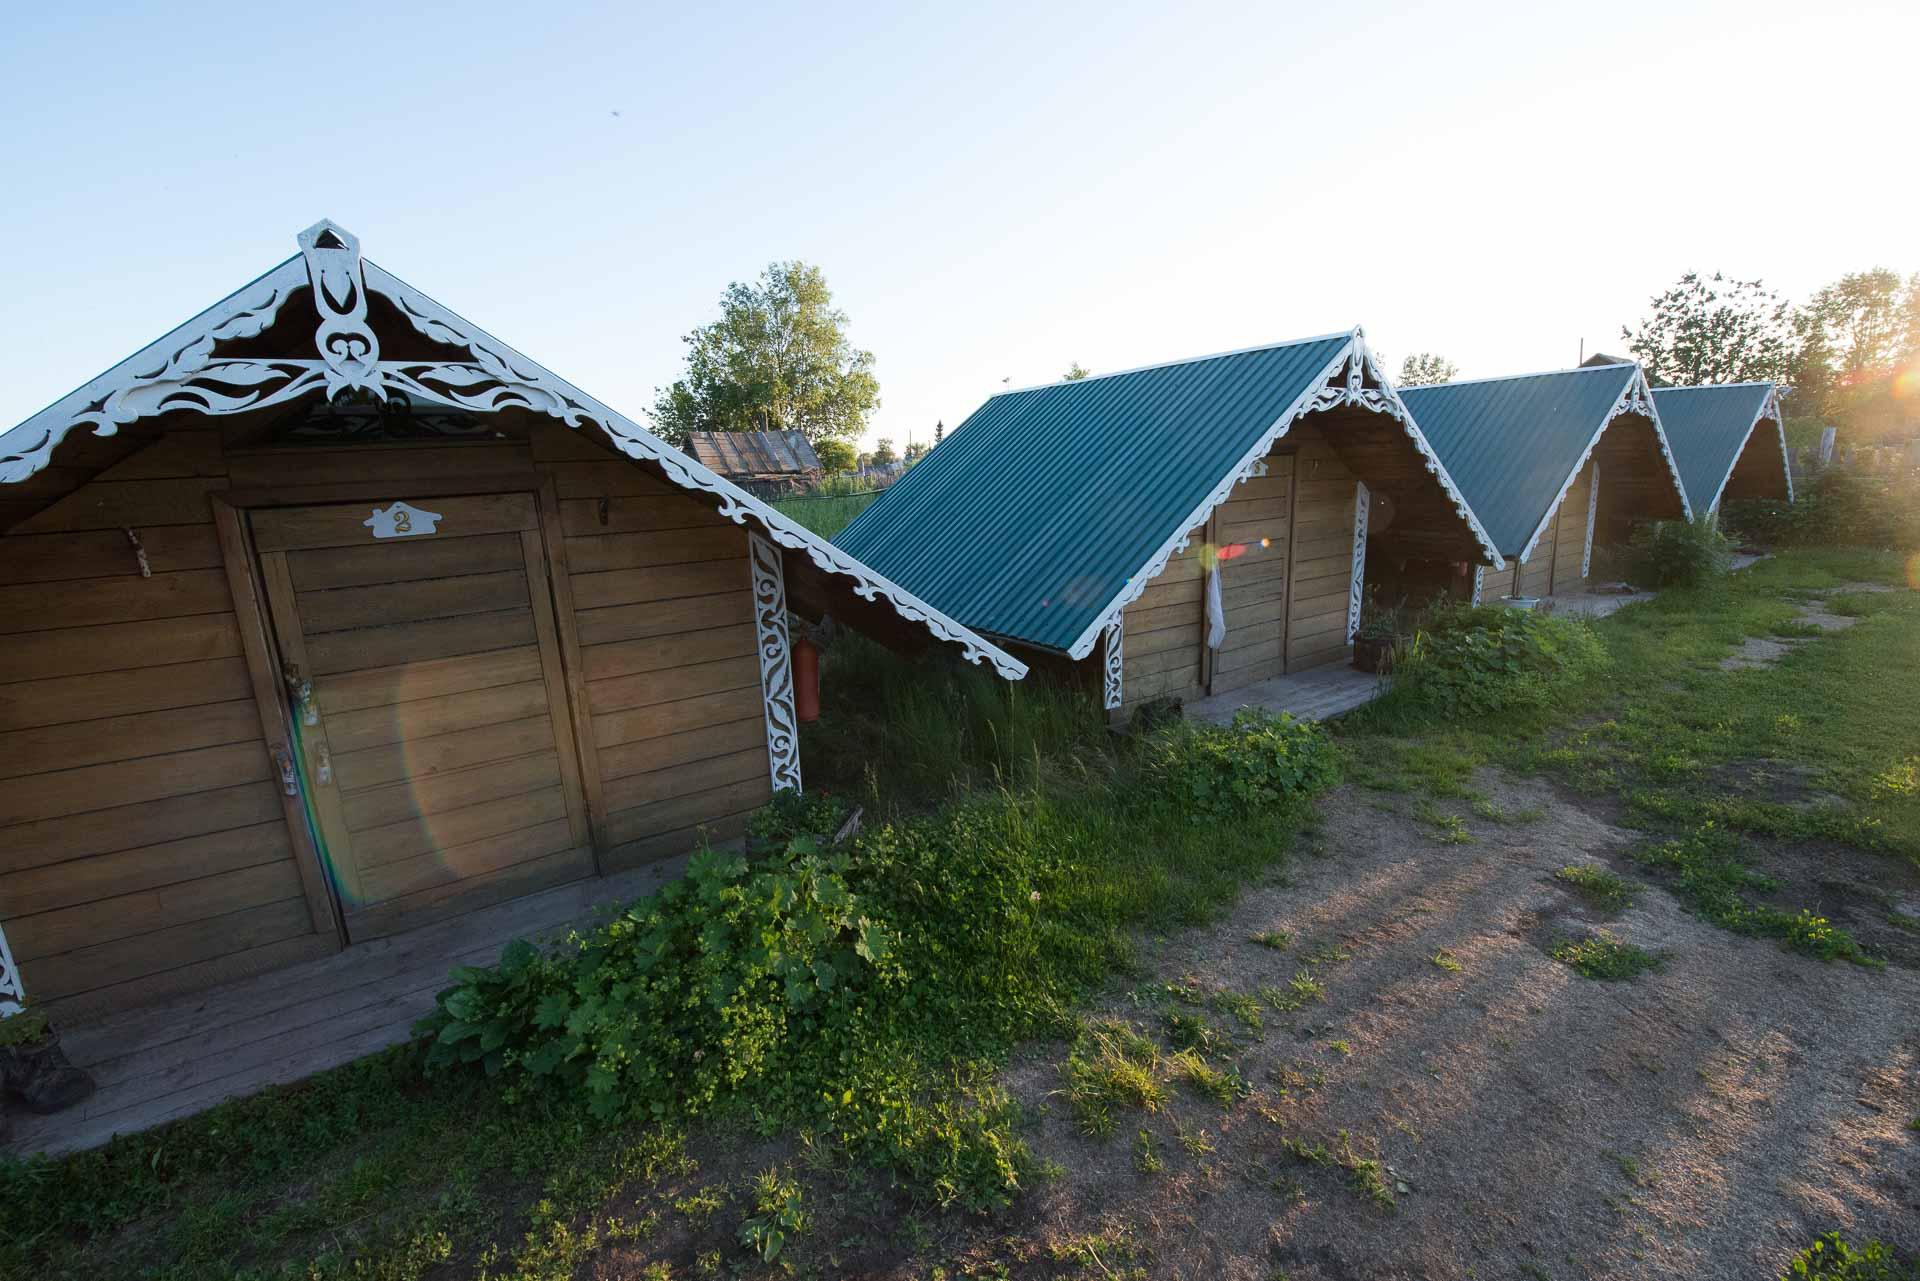 hoteles en kamchatka Kozyrevsk alojamientos